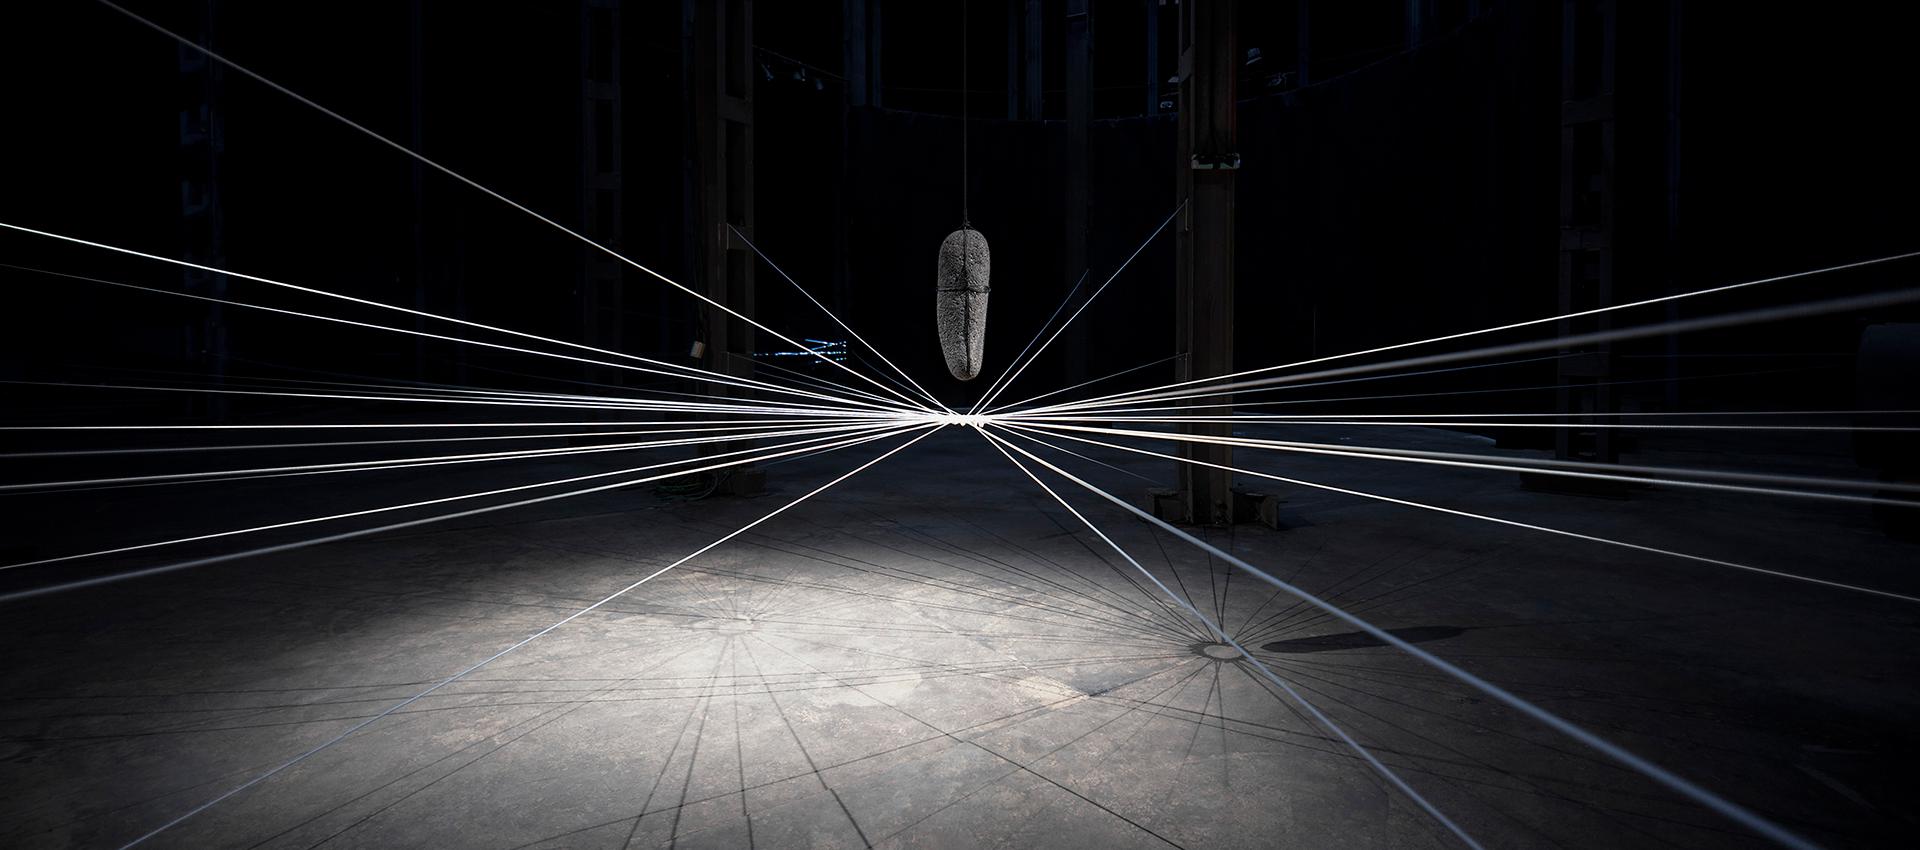 Irradiation of energy by Milton Becerra | METALOCUS